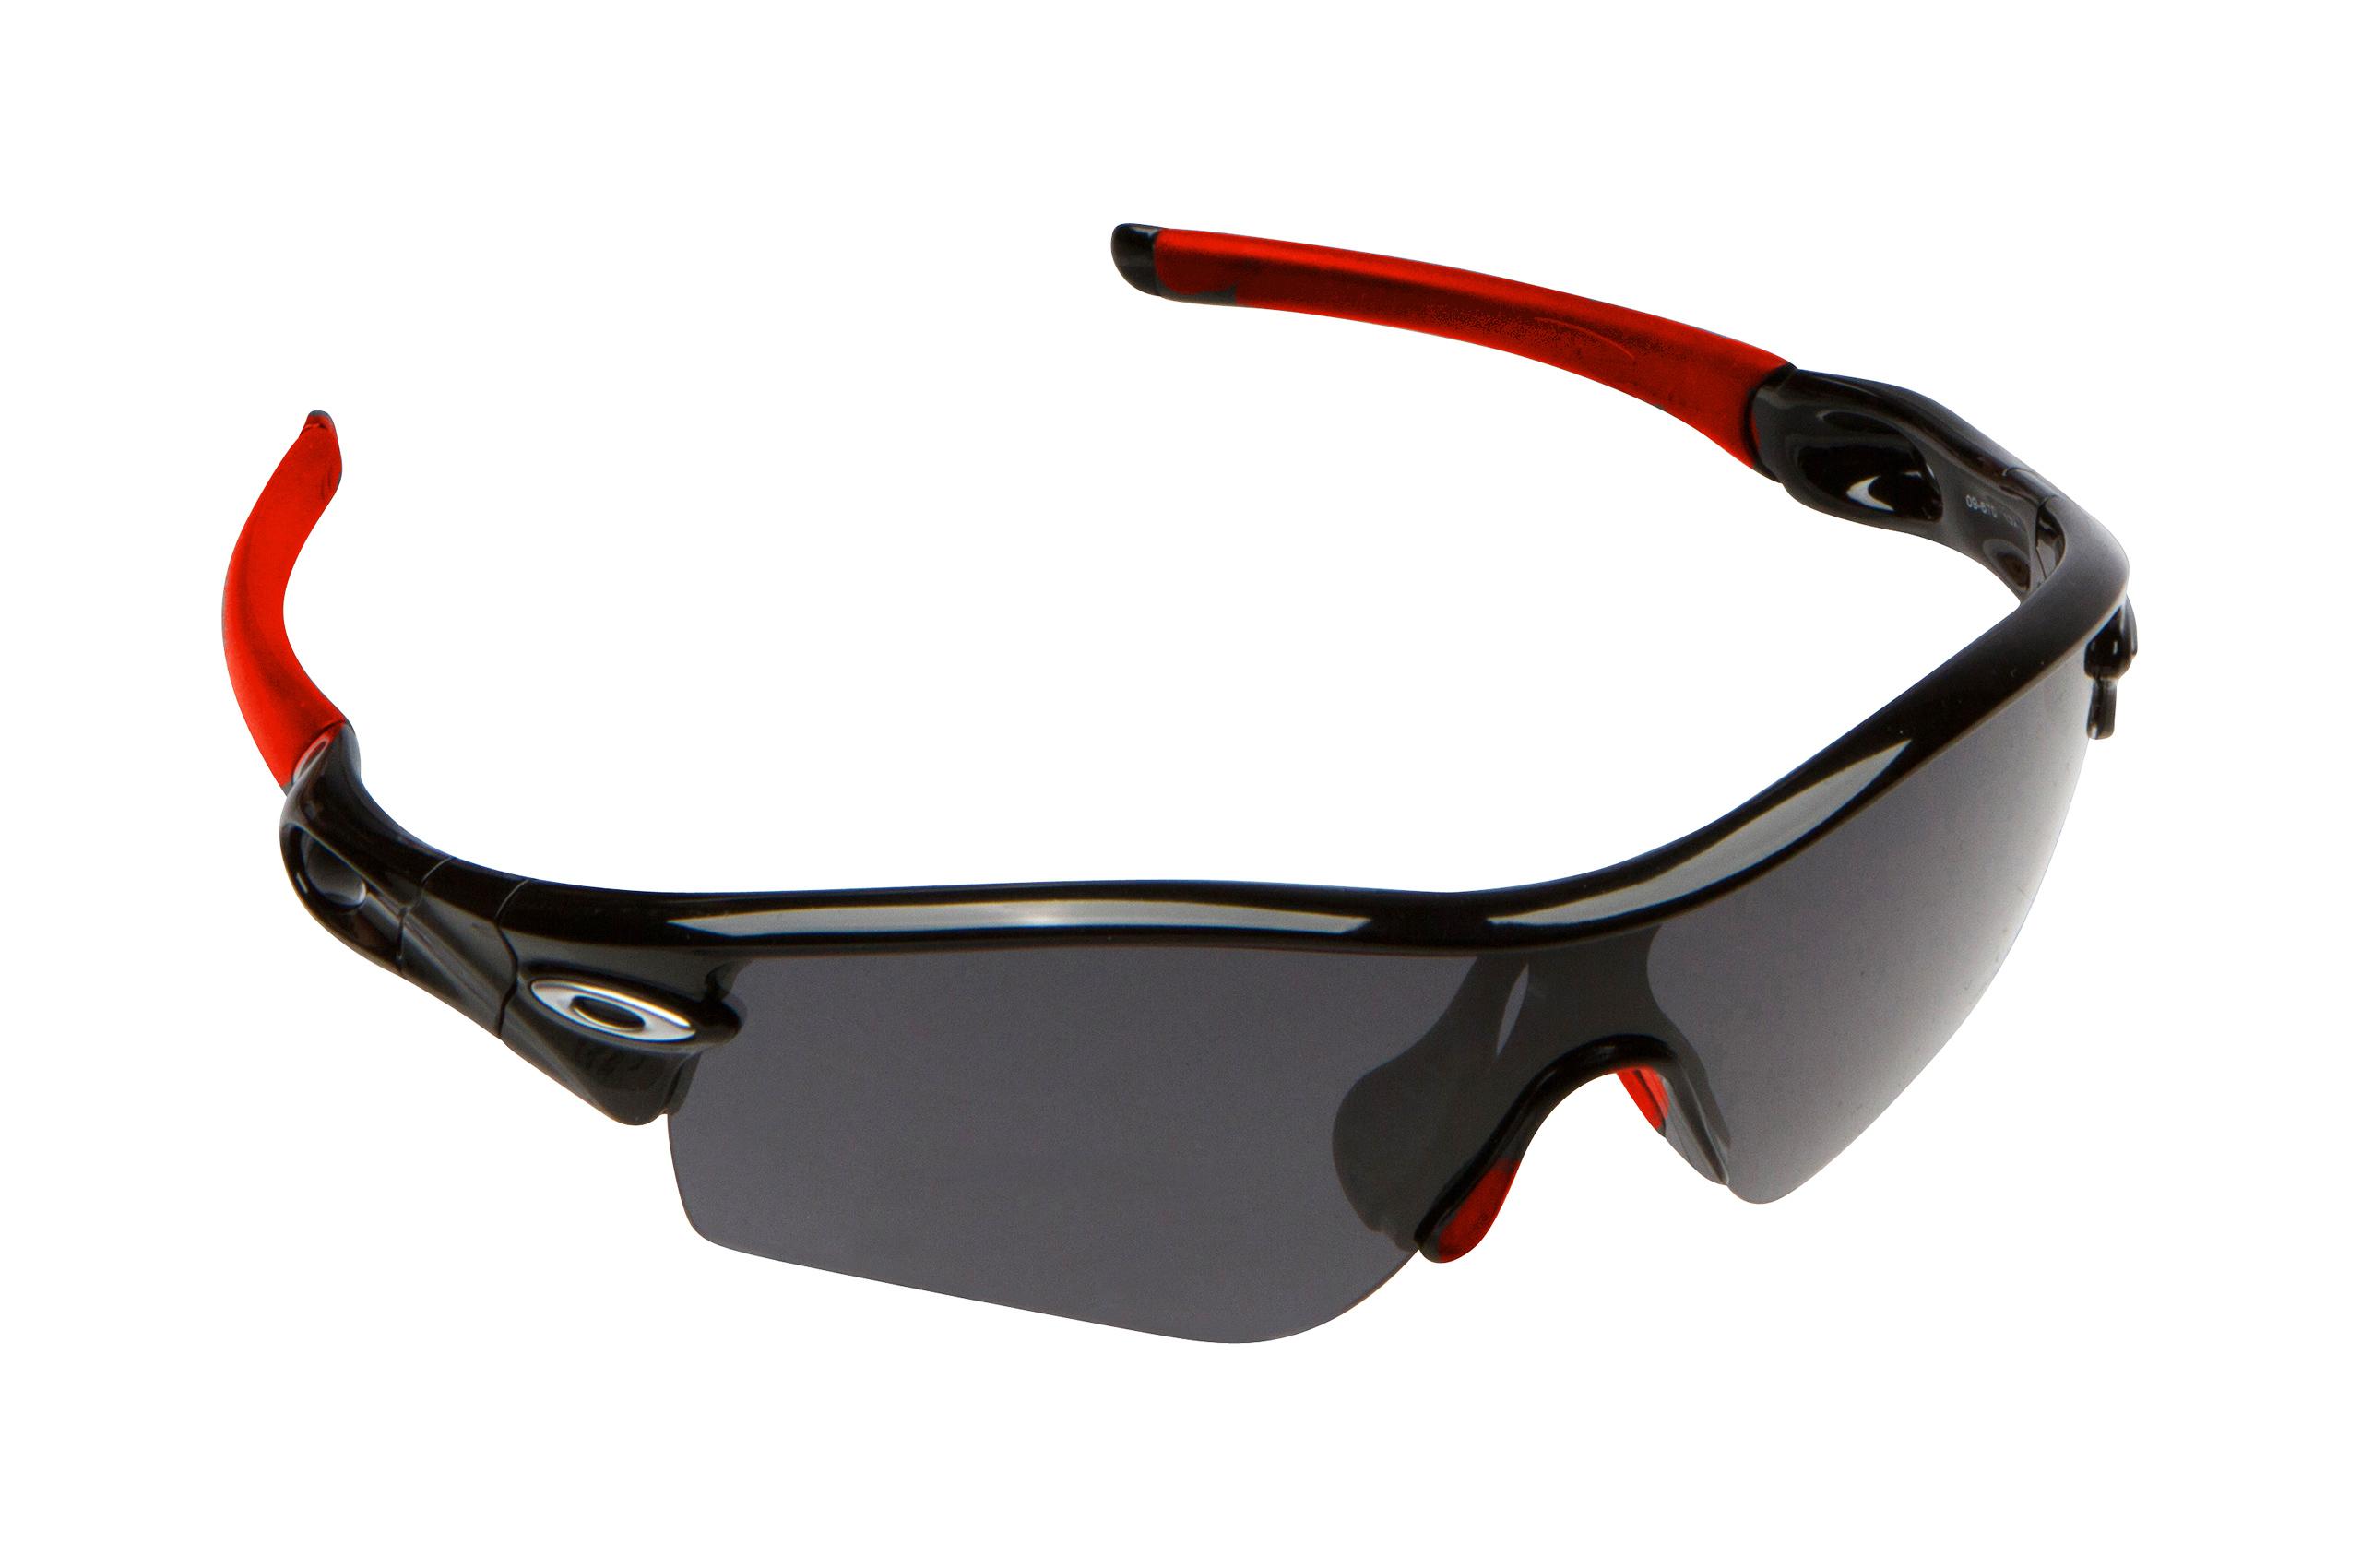 79ca2cc2a8864 New SEEK OPTICS Rubber Kit Ear   Nose Pads for Oakley RADAR - Multiple  Options - Walmart.com